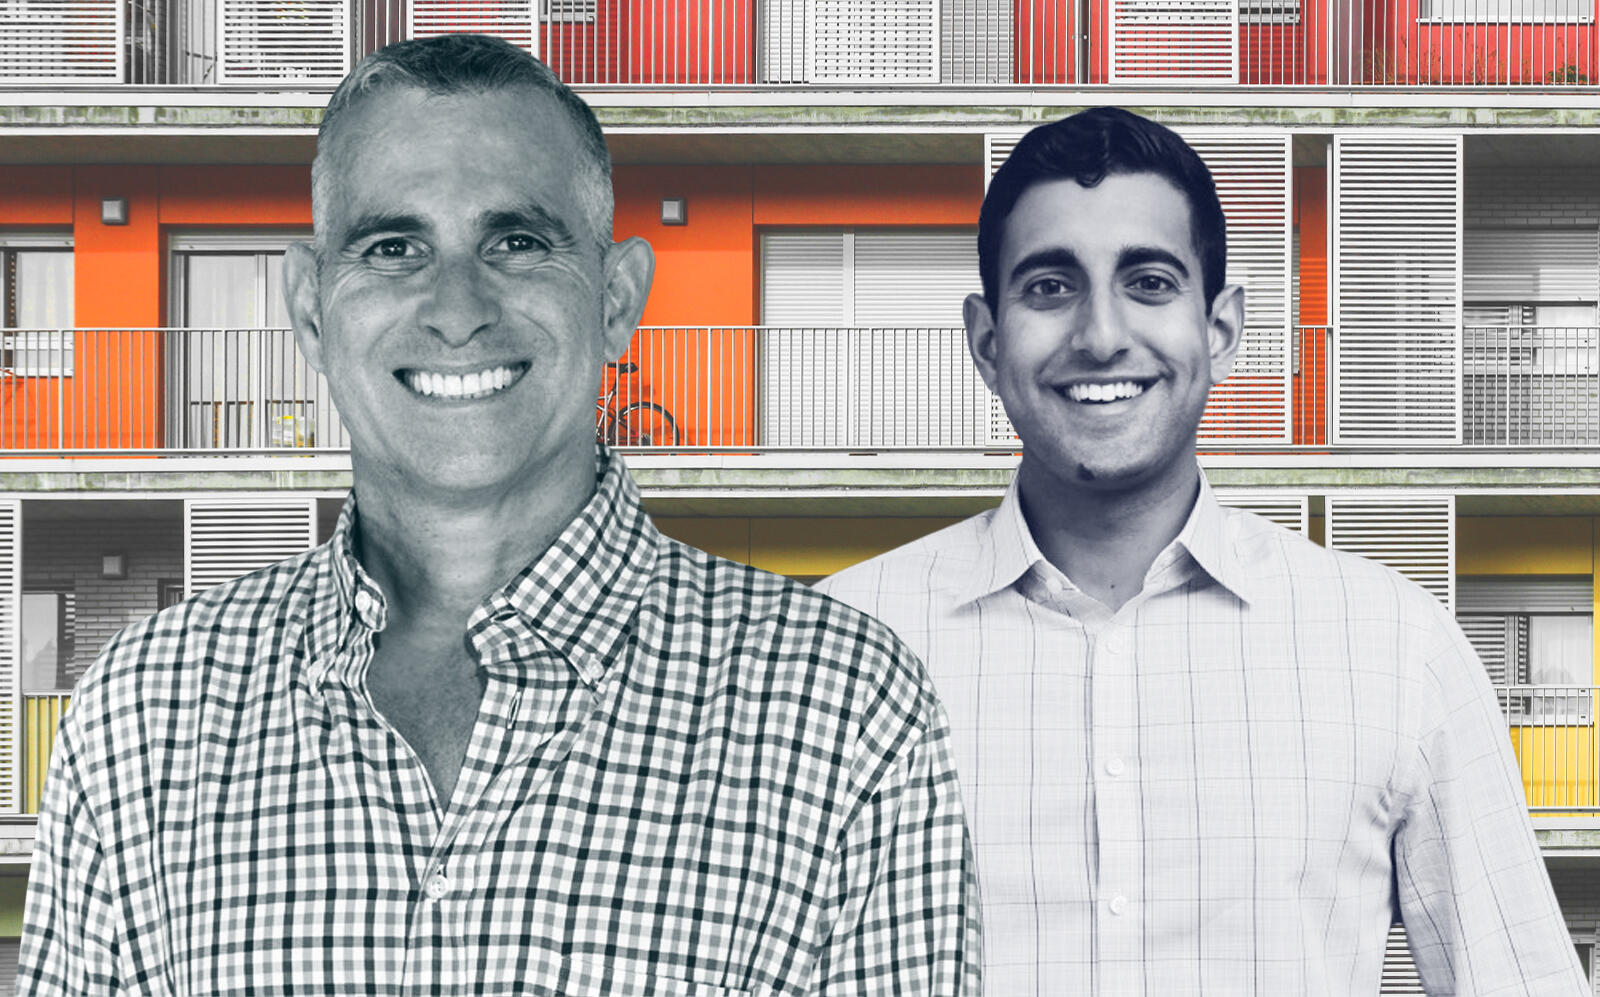 Condos.com founders Richard Swerdlow and Neel Kawale (Getty, Hauskey, Condos.com)